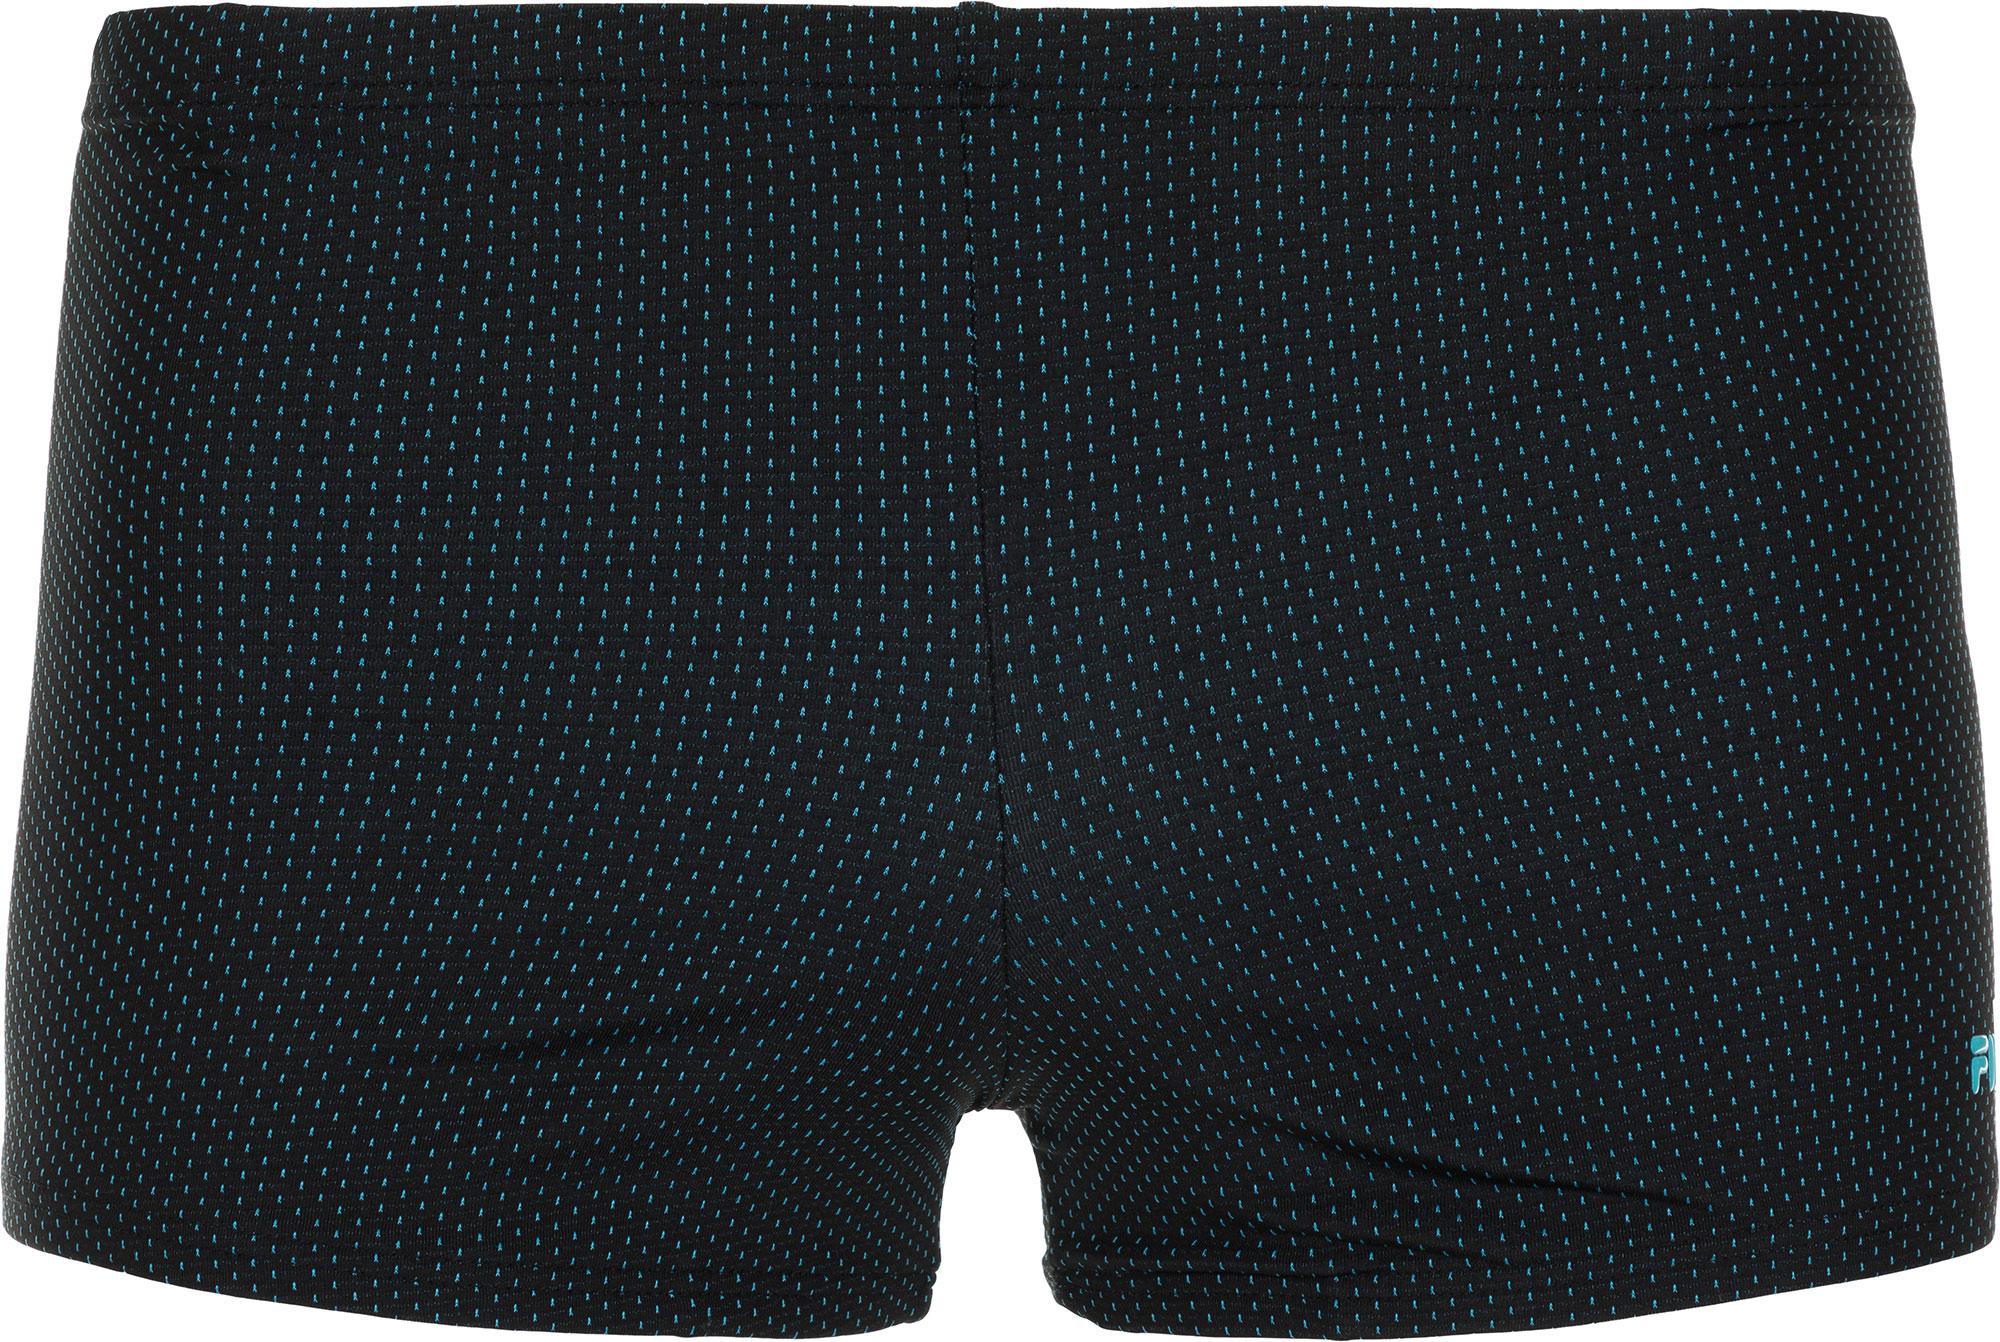 все цены на Fila Плавки-шорты мужские Fila, размер 56 онлайн